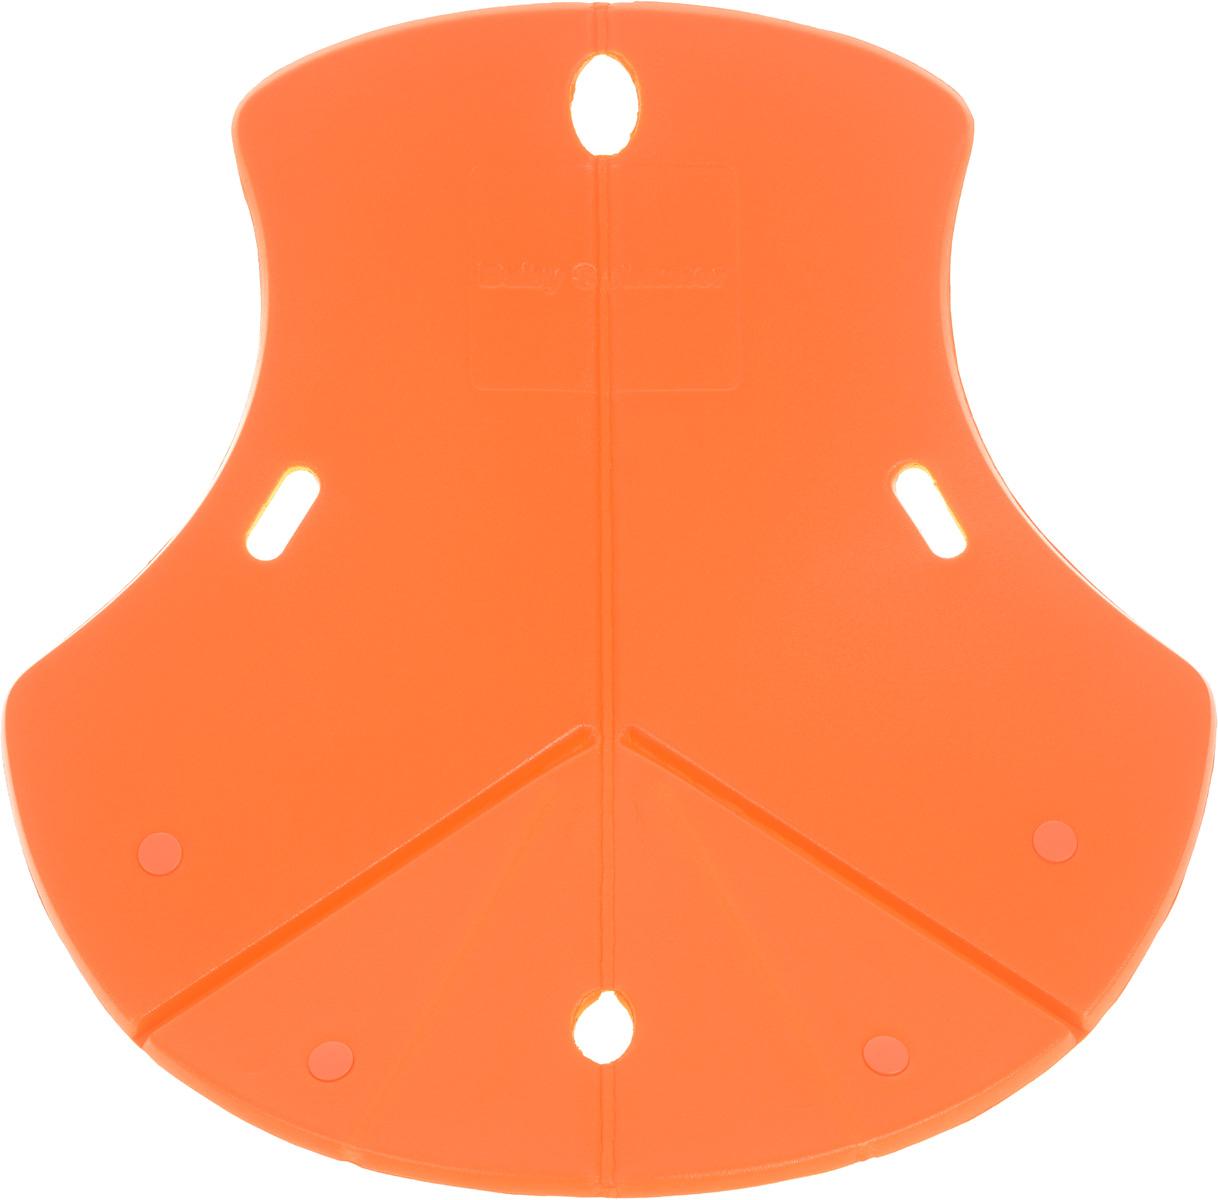 Baby Swimmer Складная ванночка в раковину цвет оранжевый -  Аксессуары для ванной комнаты